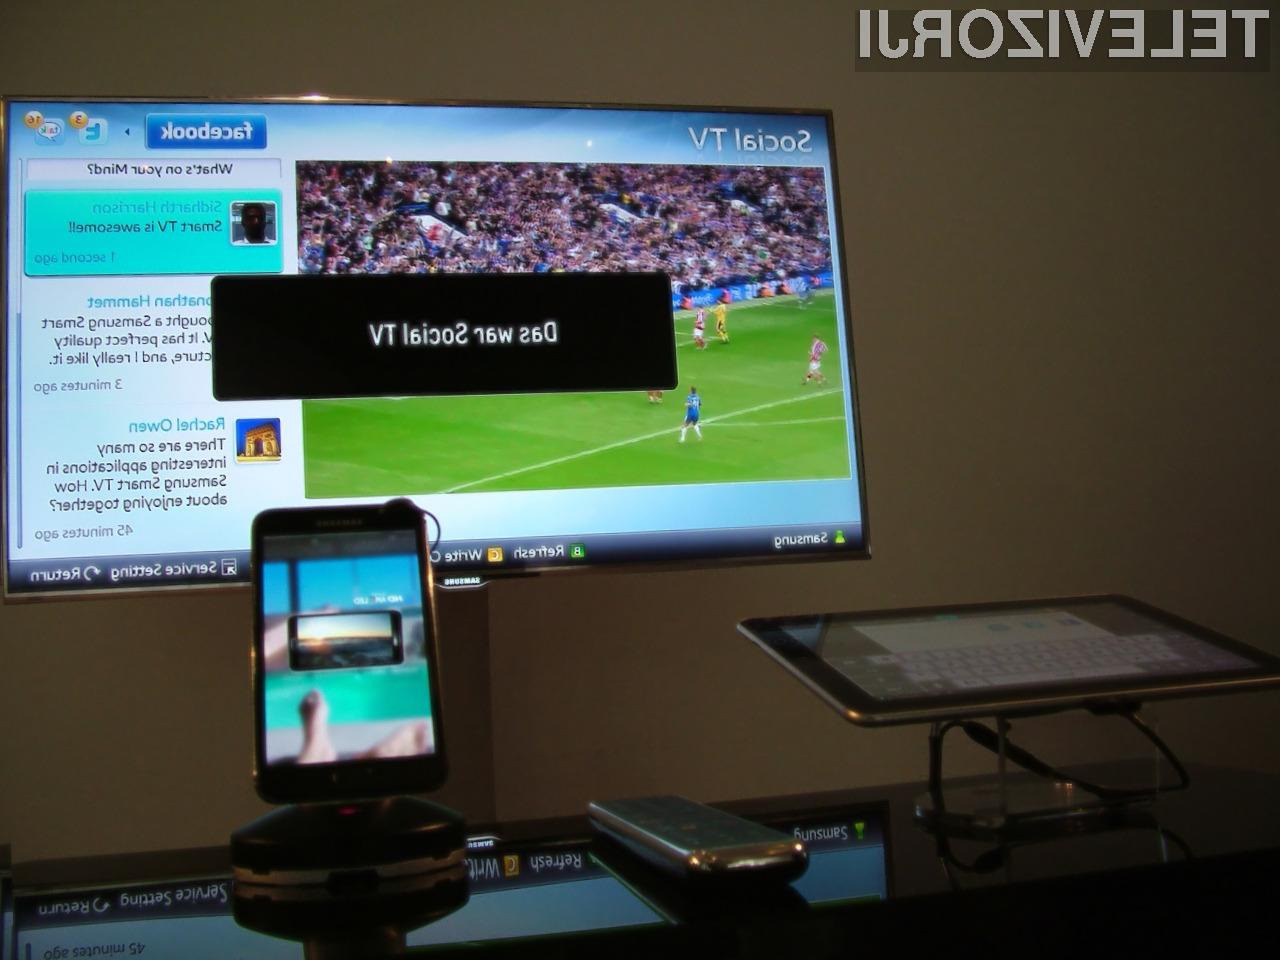 Konvergenca tehnologij po Samsungovo!